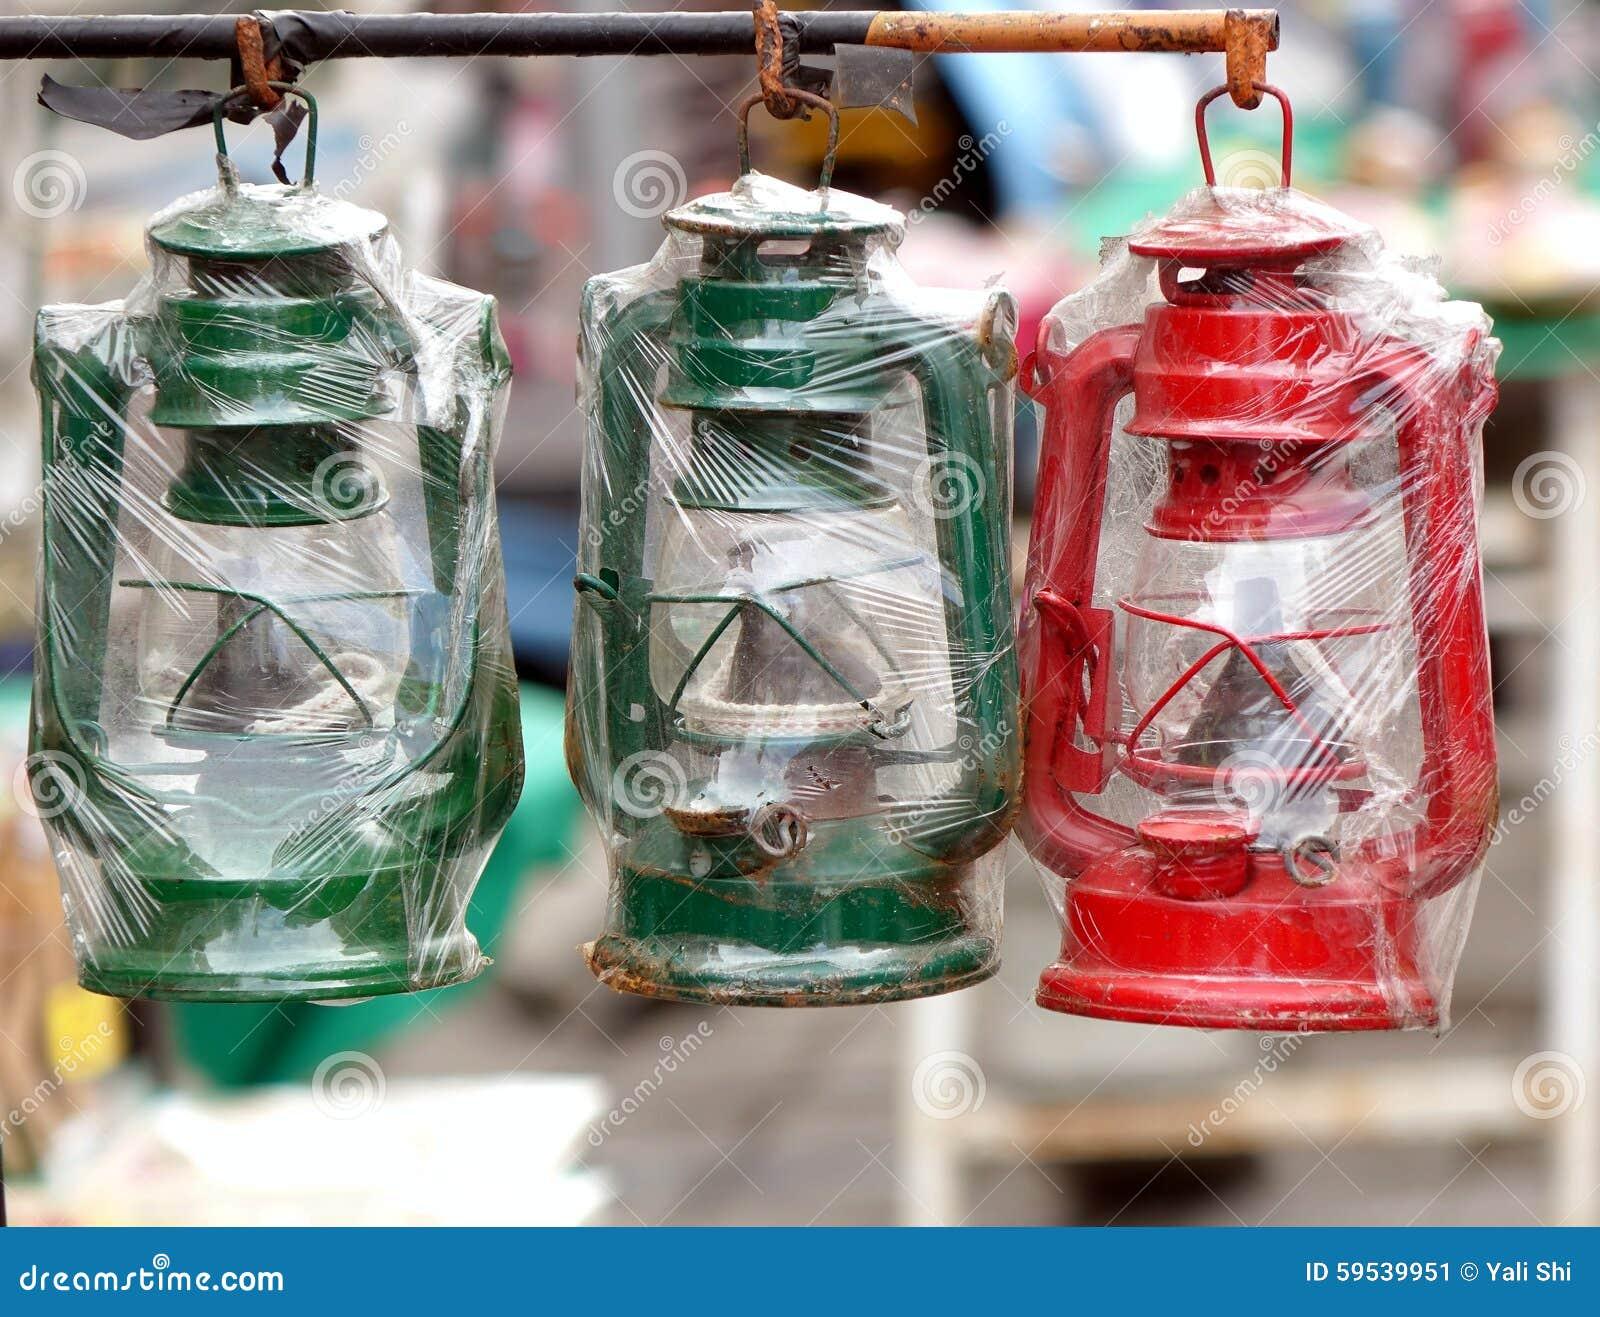 Vintage Kerosene Lanterns For Sale Stock Image - Image of ...